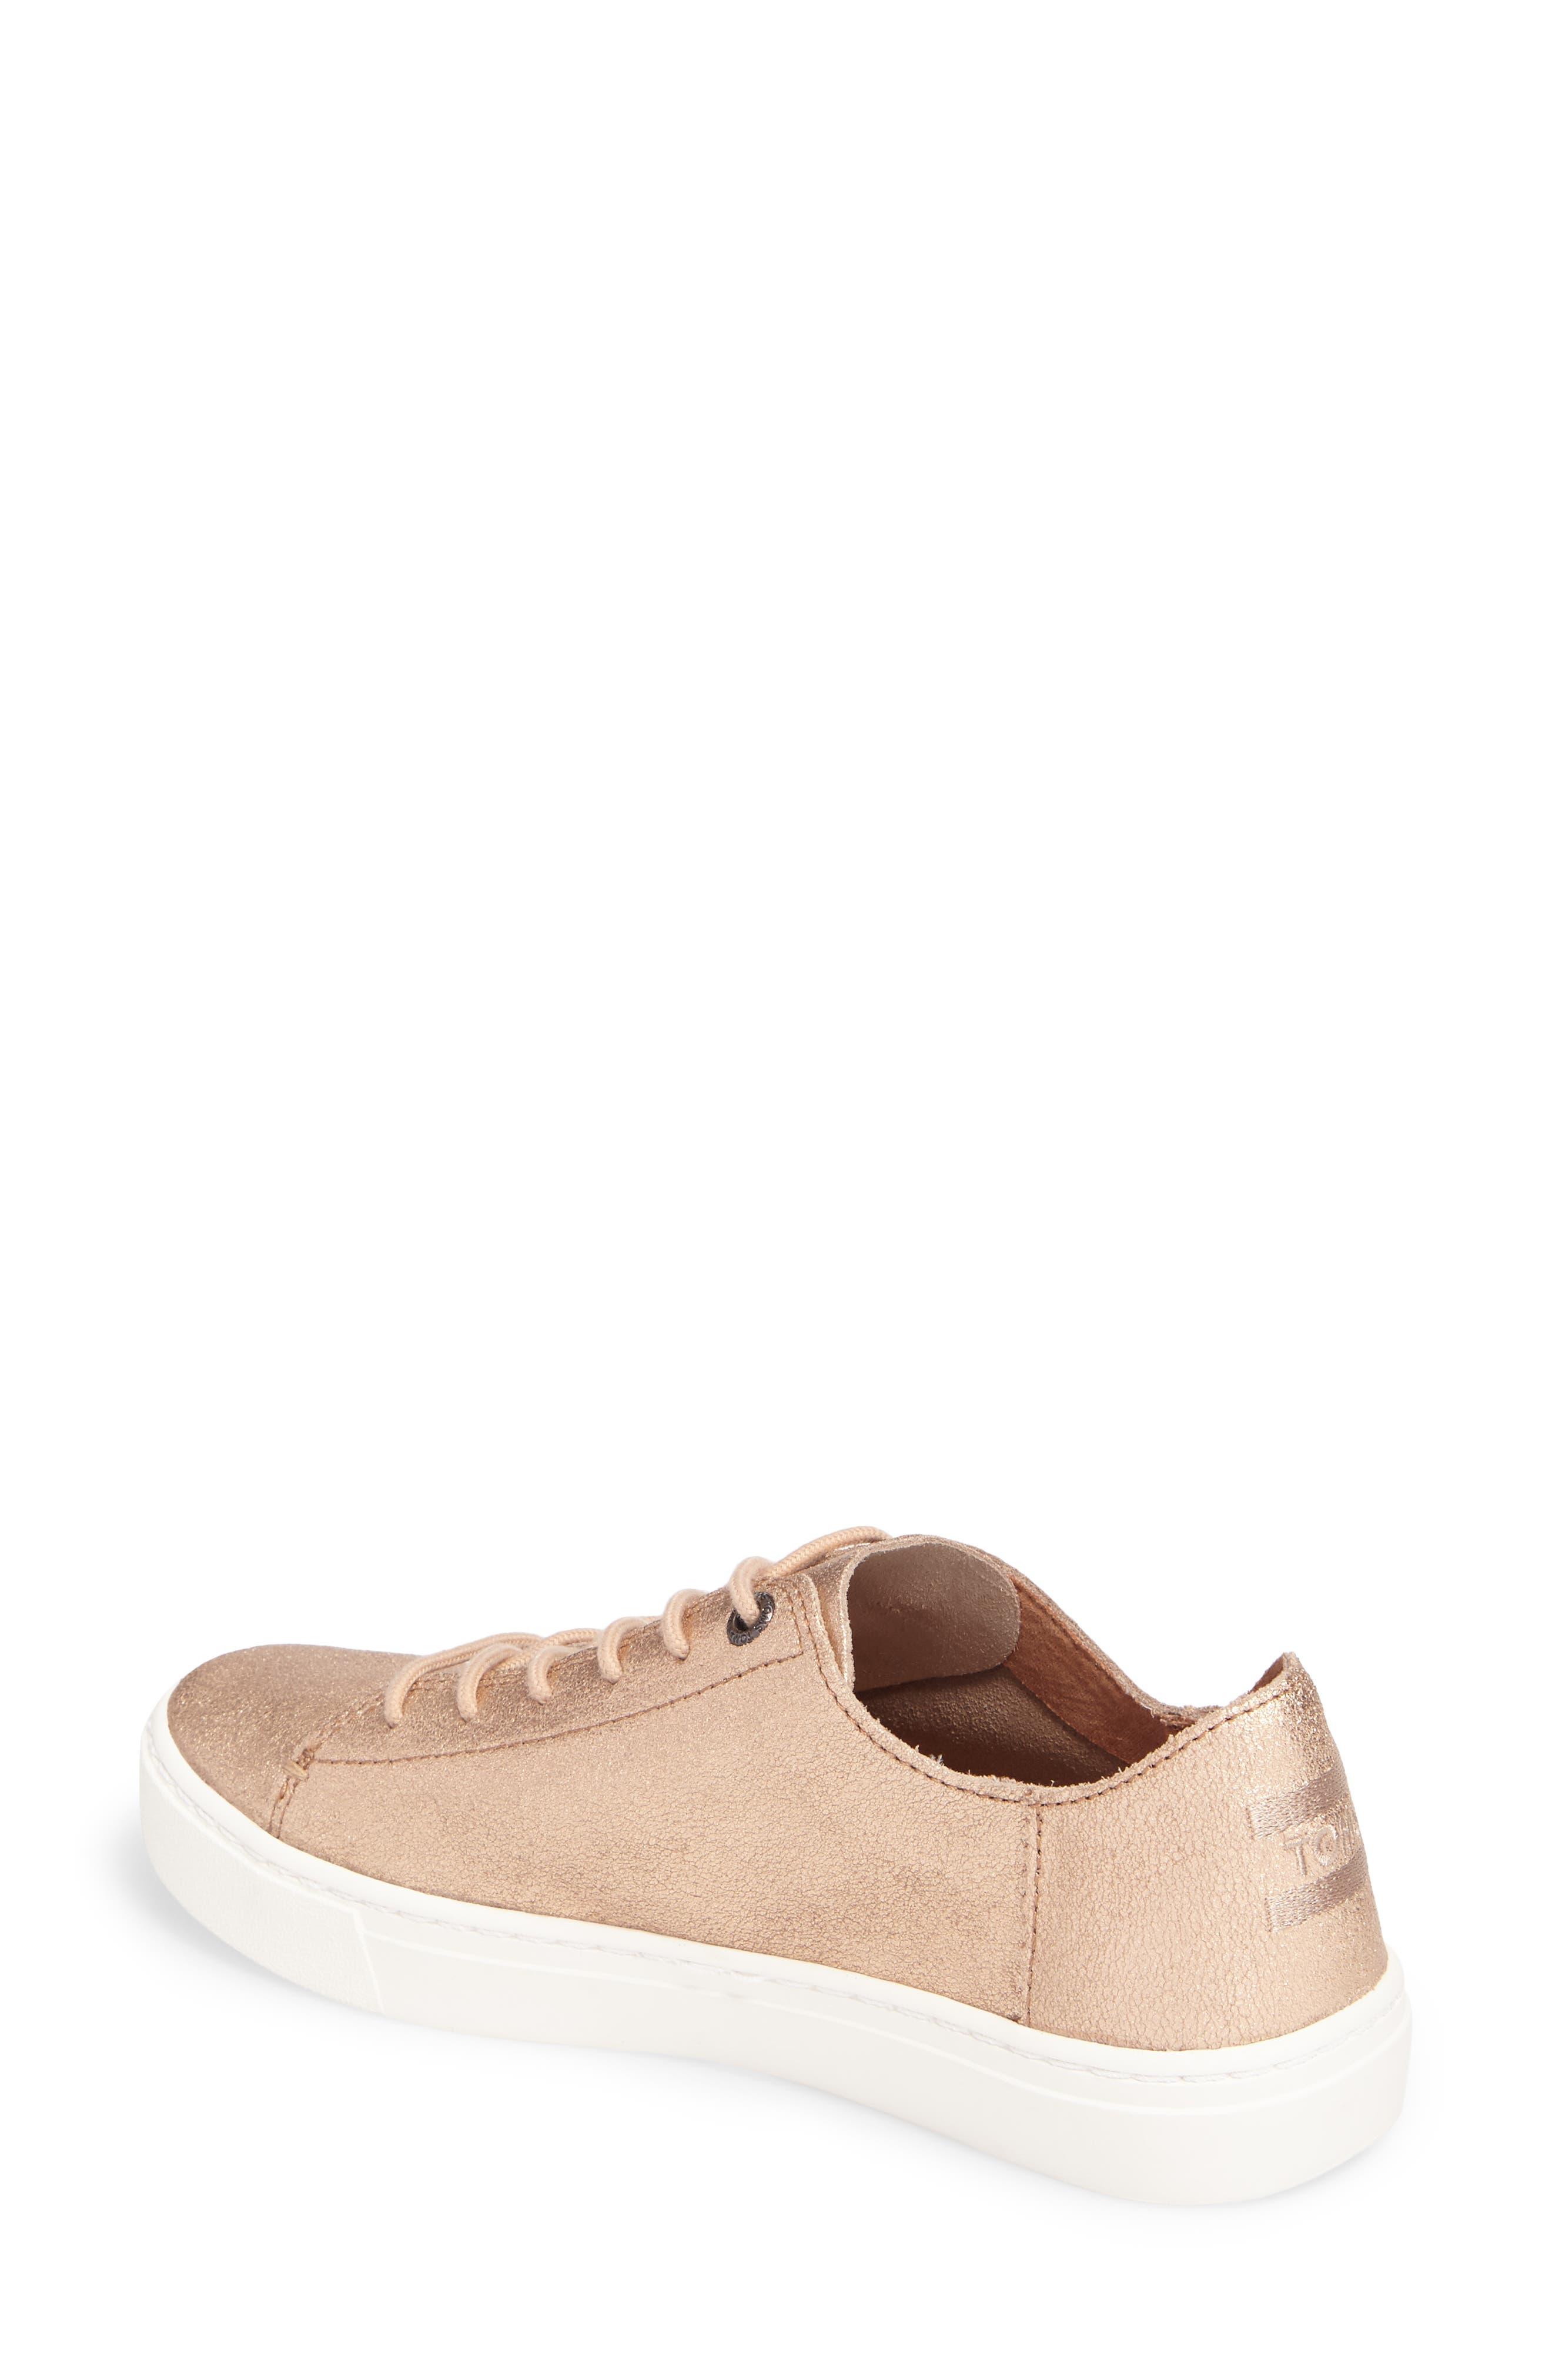 Lenox Sneaker,                             Alternate thumbnail 29, color,